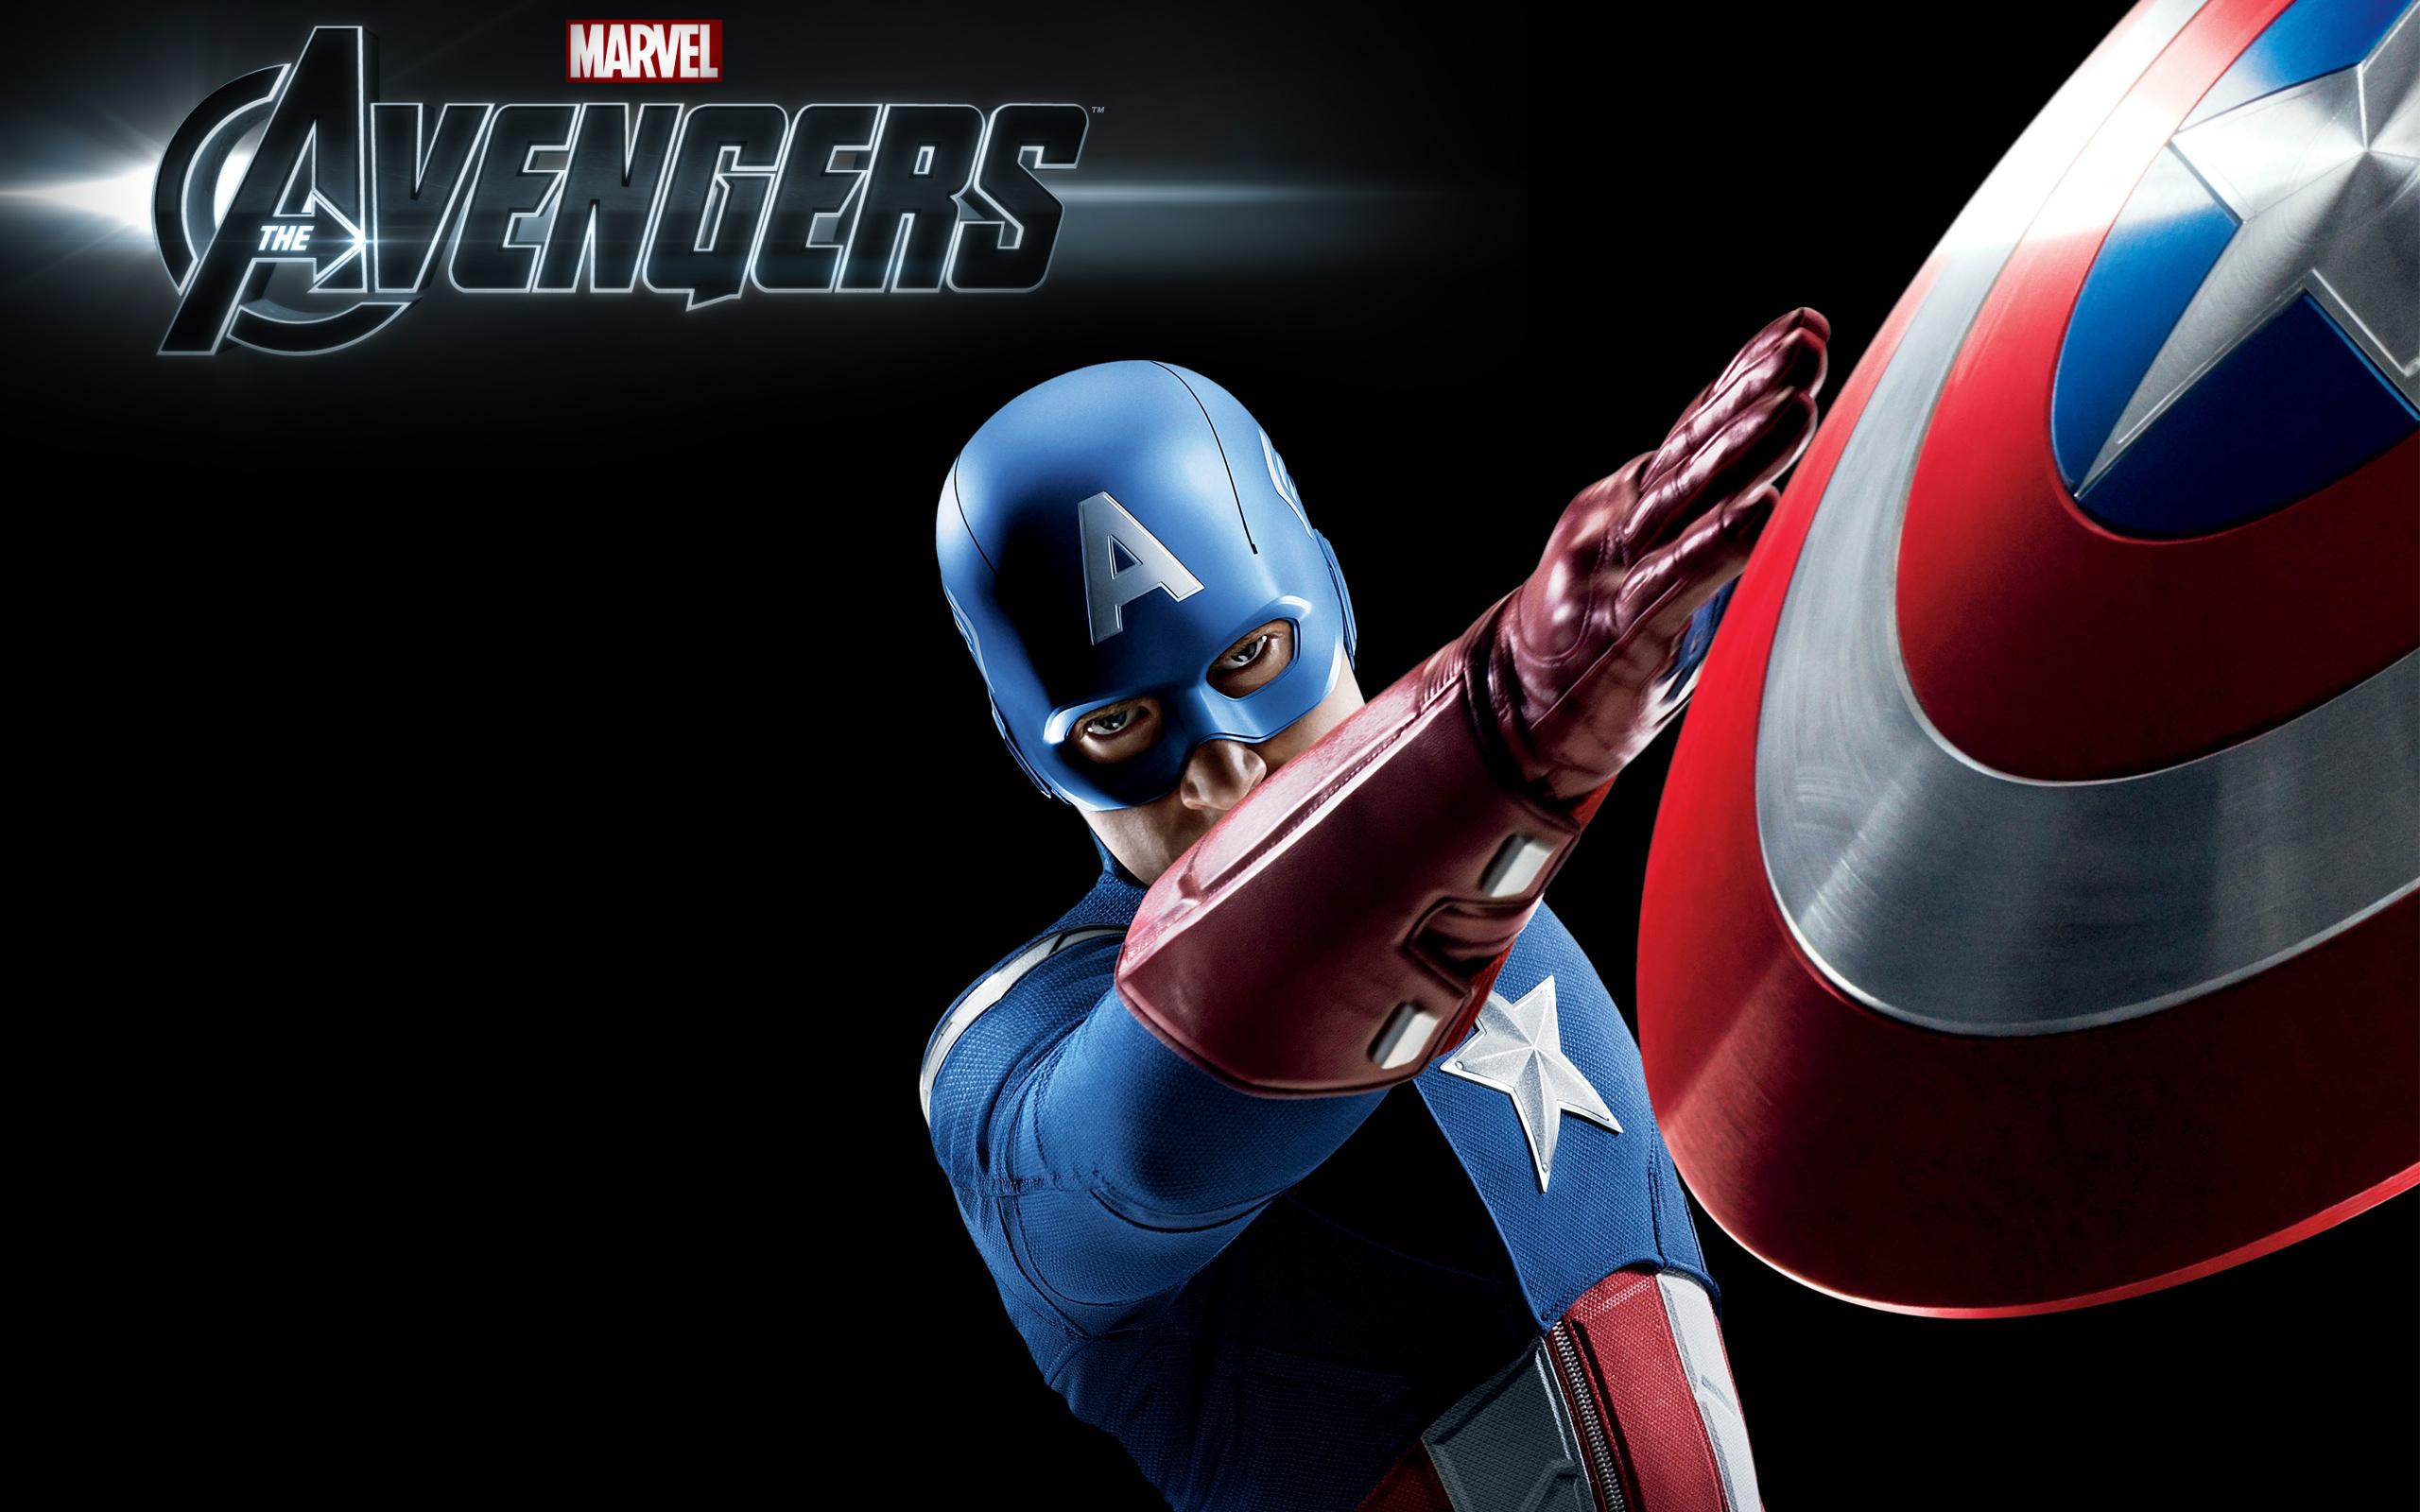 Download Captain America Avengers 2 HD Desktop Wallpapers We provide 2560x1600